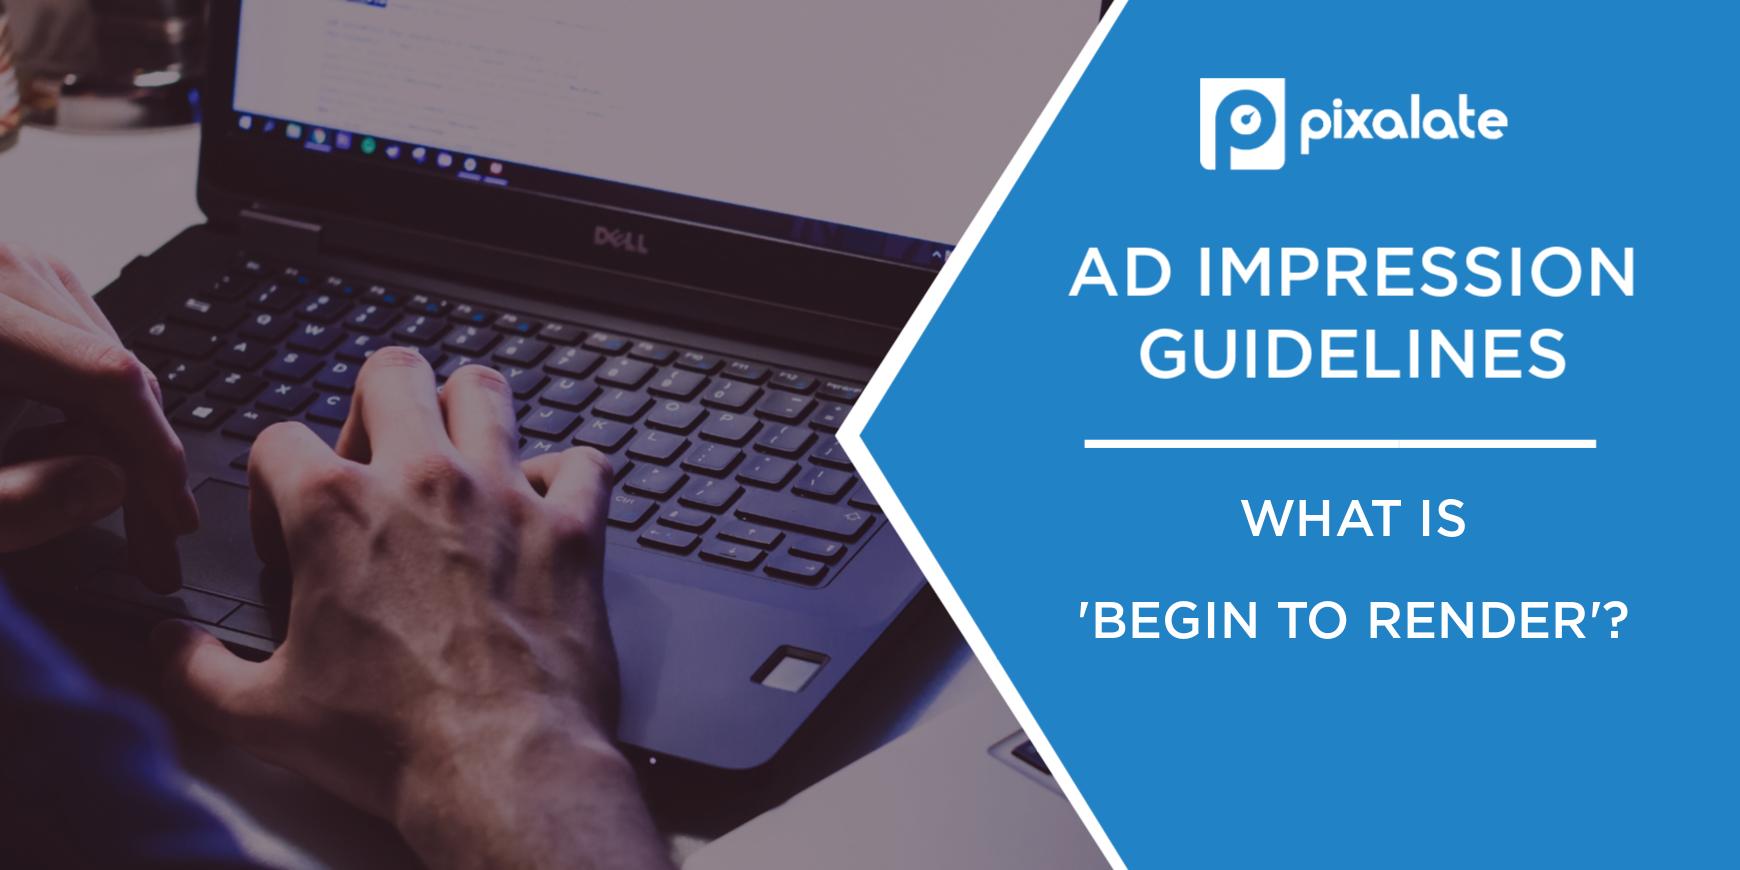 ad-impression-guidelines-begin-to-render-measurement